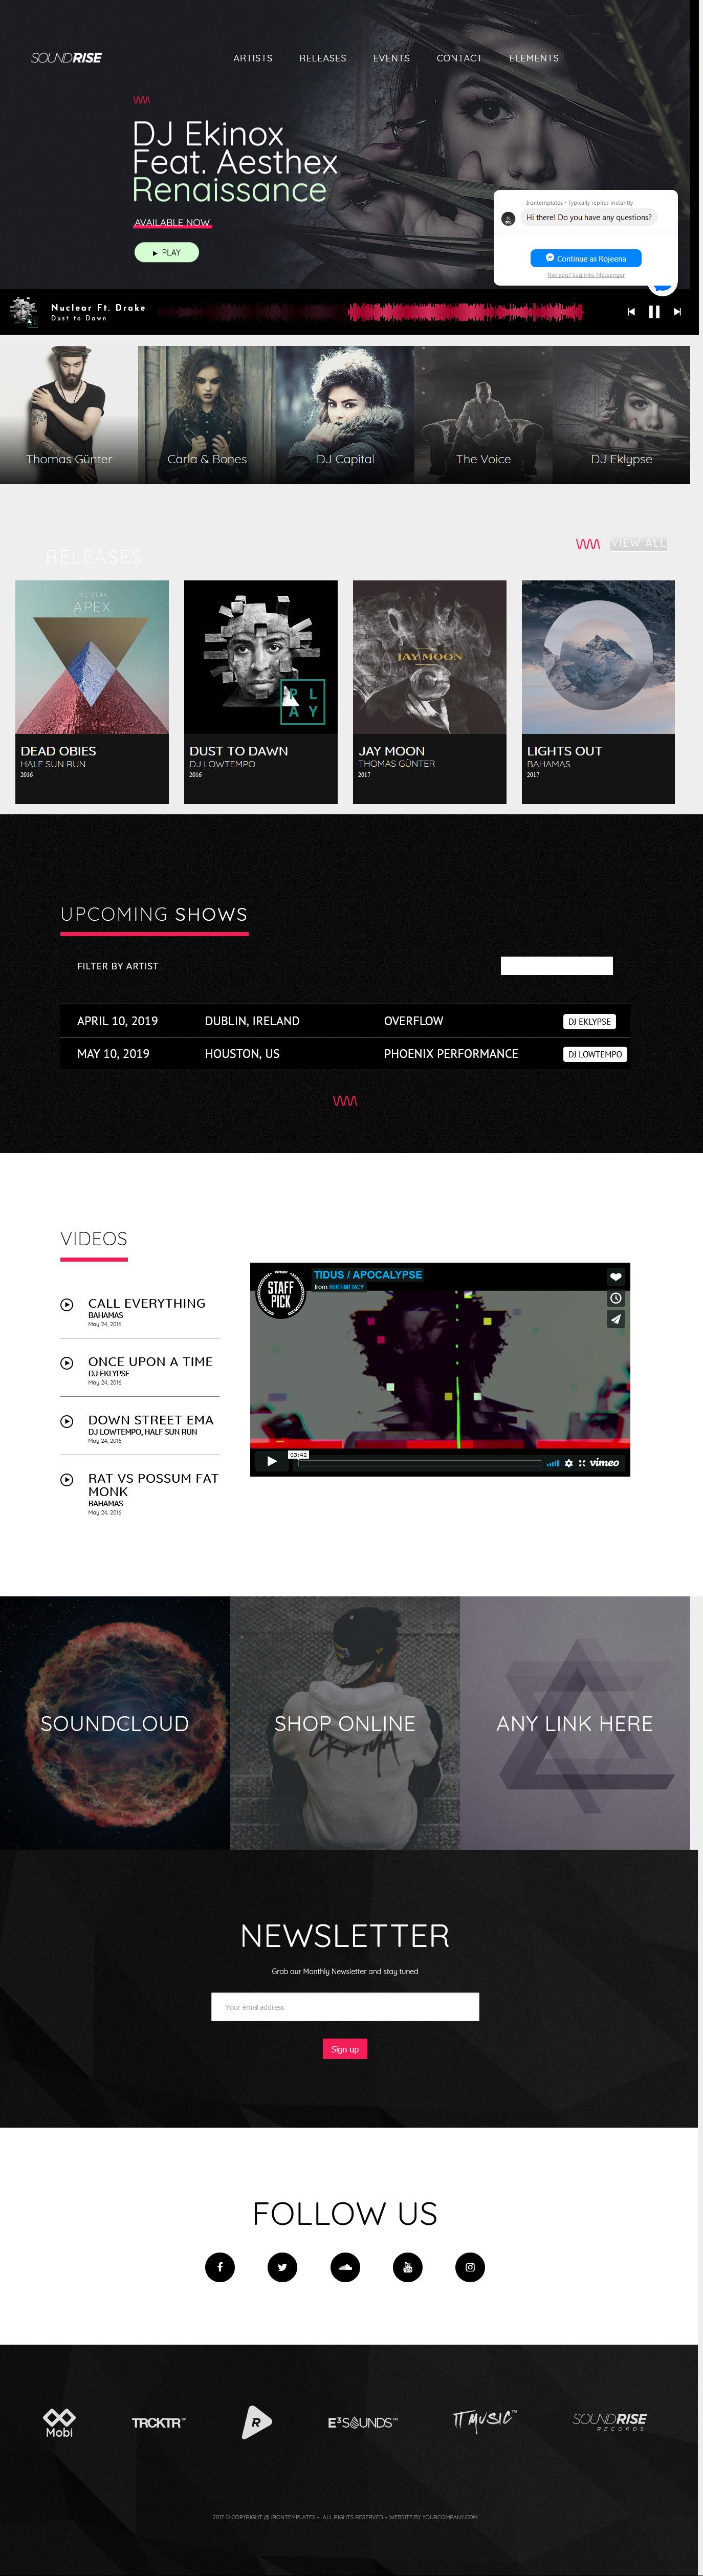 soundrise best premium video music wordpress theme - 10+ Best Video and Music WordPress Themes (Premium Version)